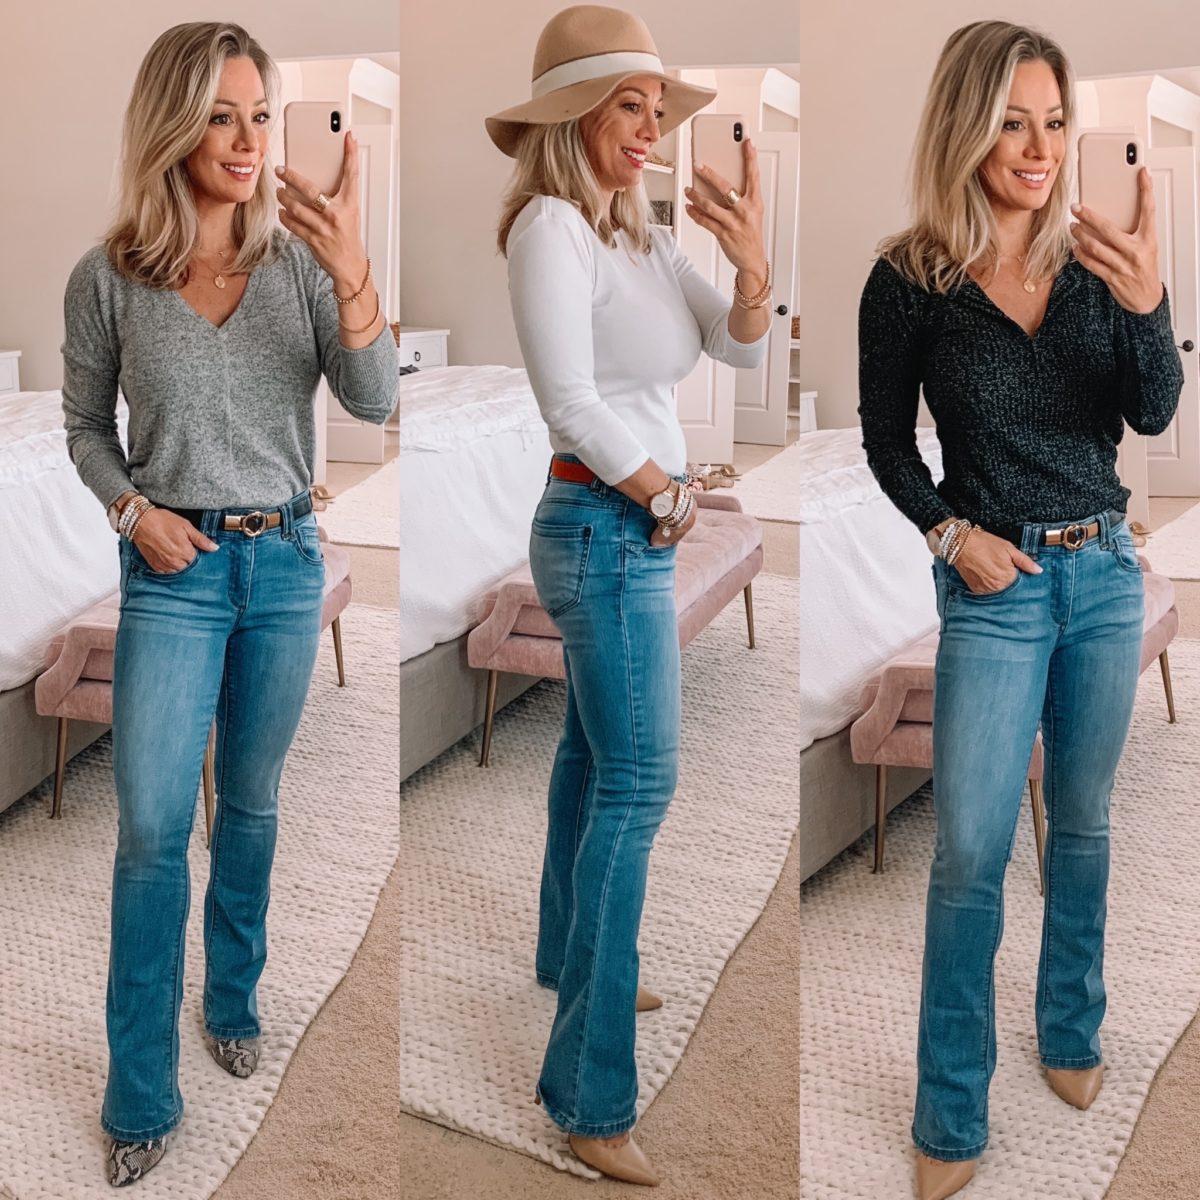 Nordstrom Anniversary Sale 2020 Wit & Wisdom Jeans